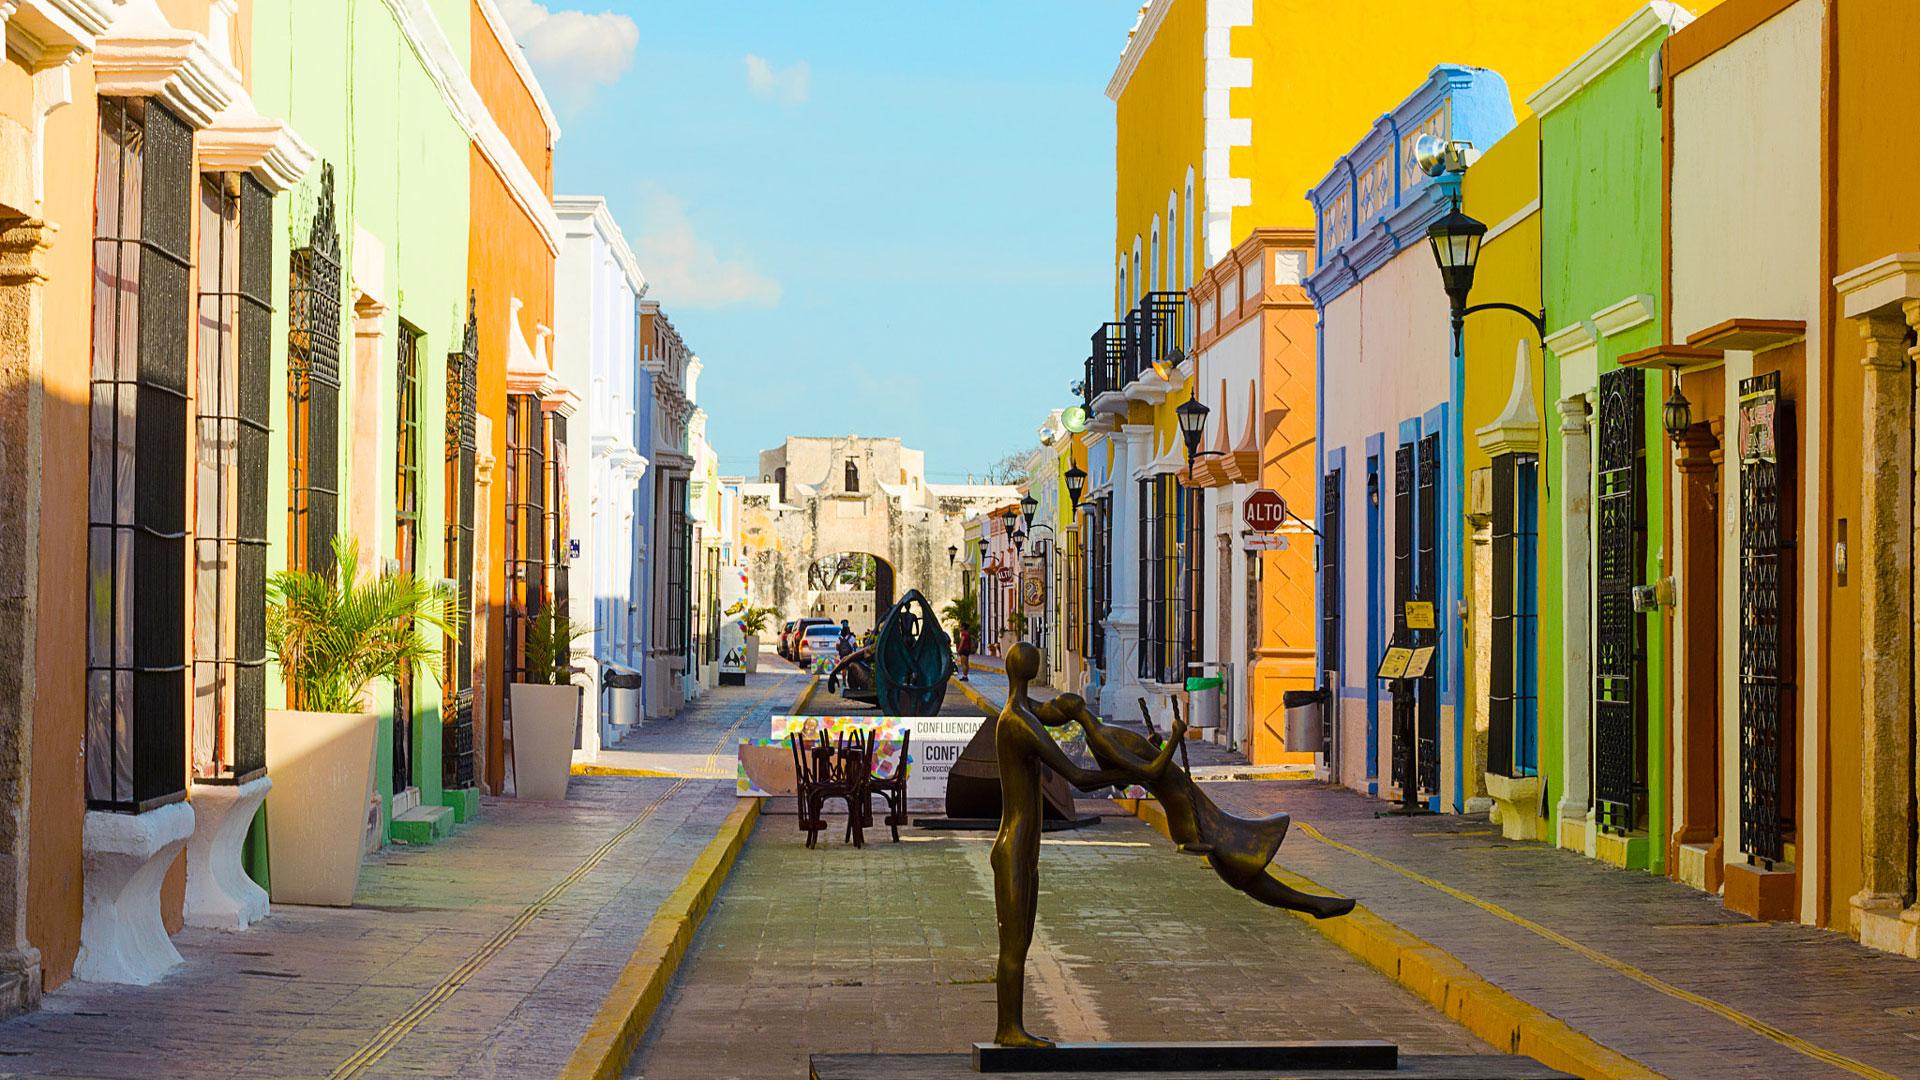 Campeche Ciudad Patrimonio. Foto: Discover Travel News